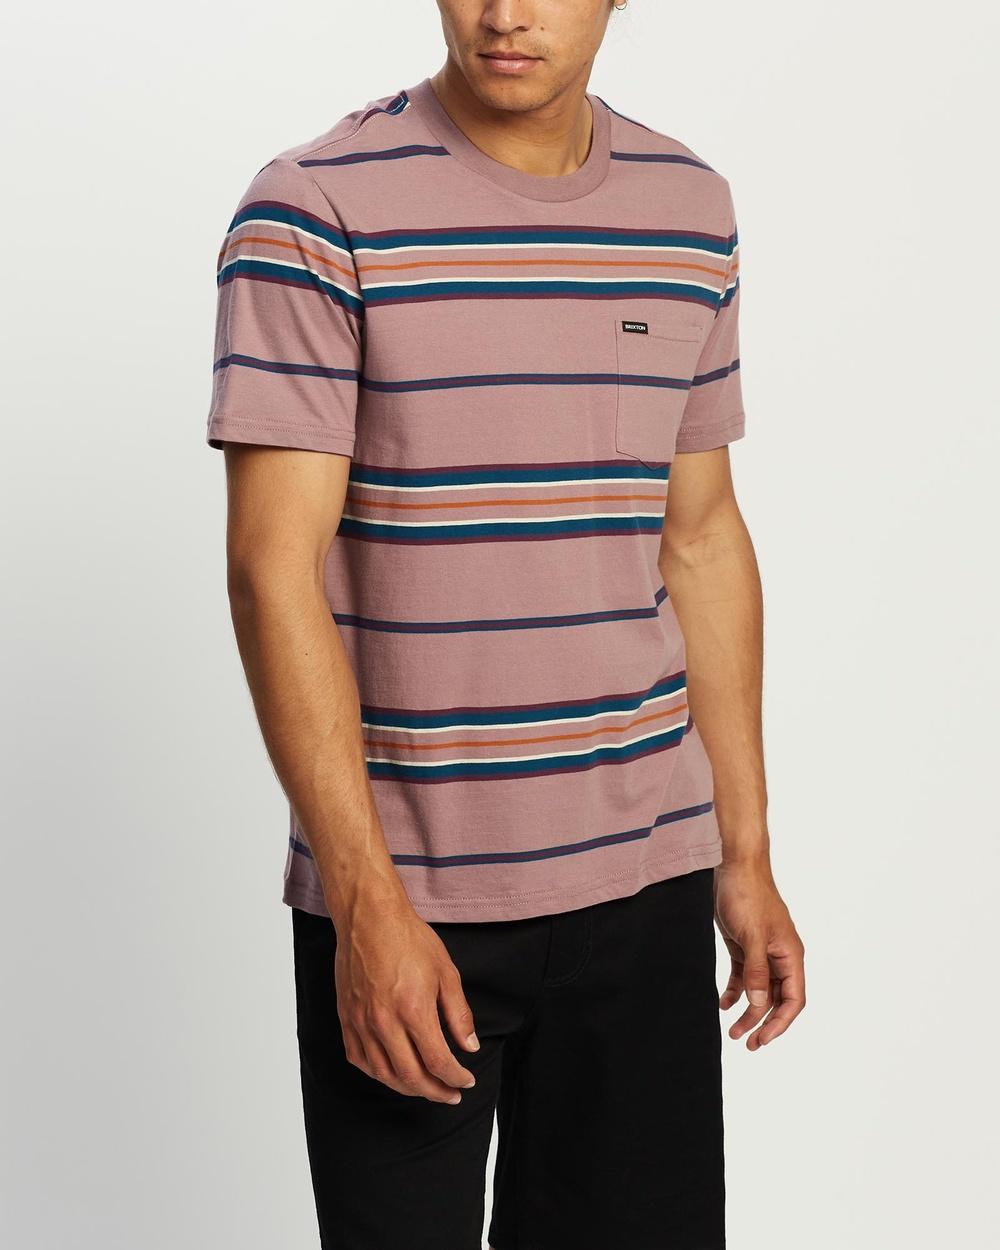 Brixton Hilt SS Pocket Knit Tee T-Shirts & Singlets Washed Concord Australia